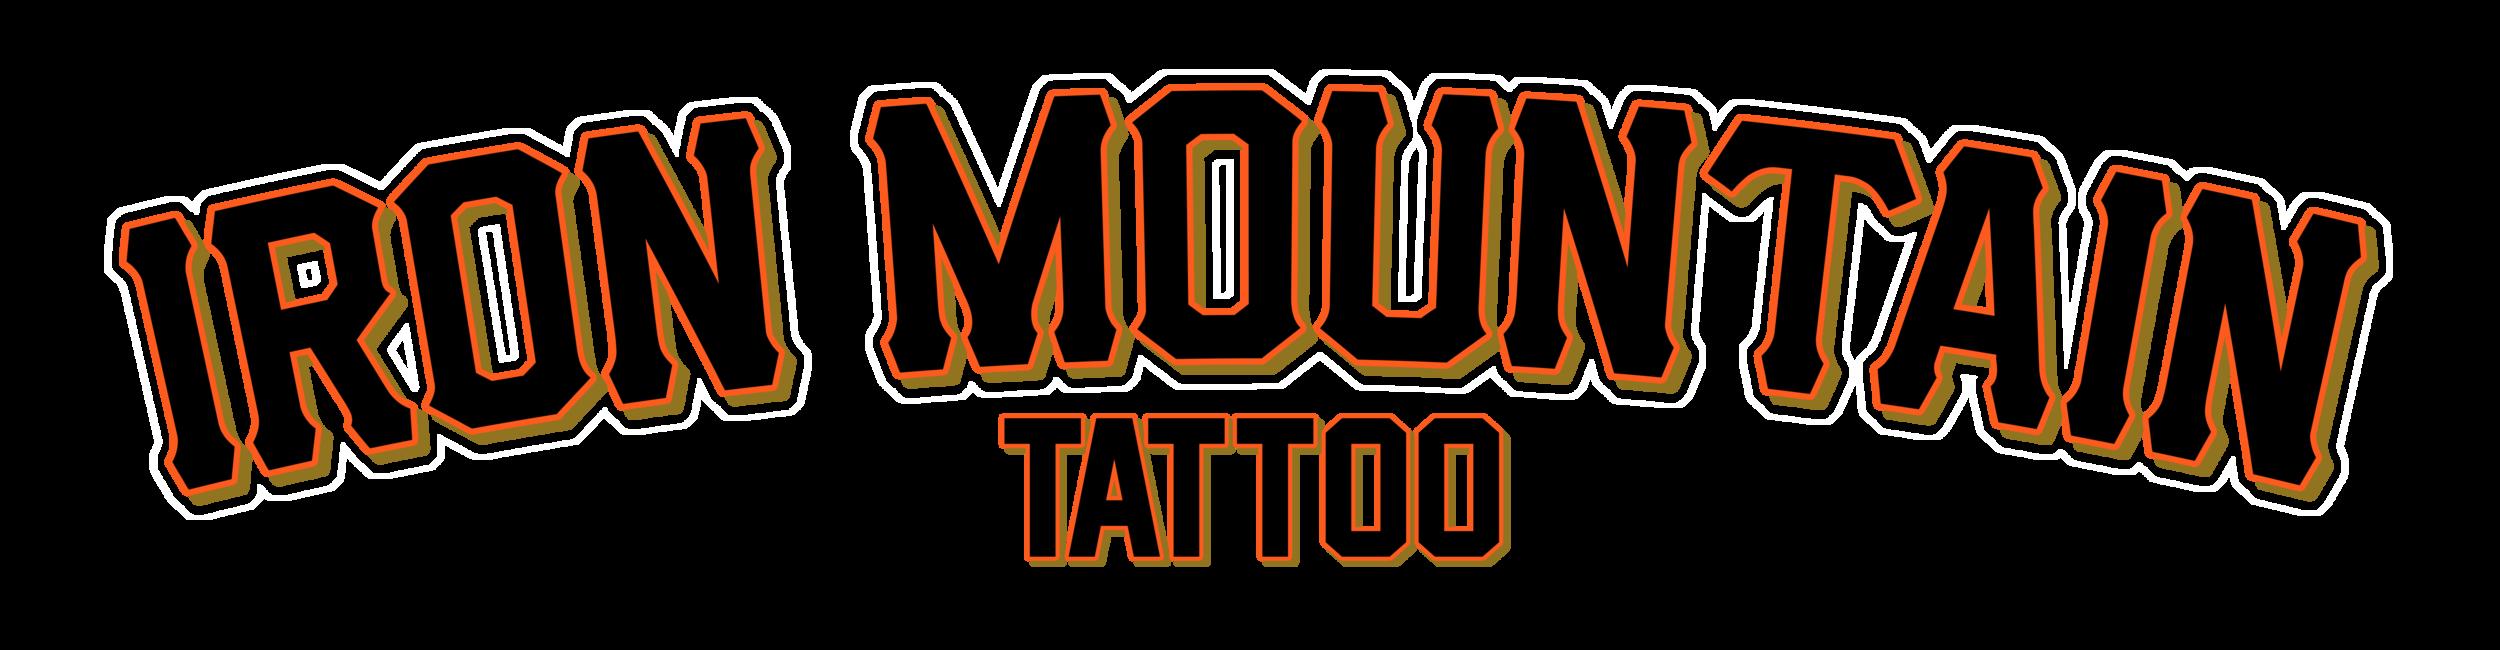 NorCal Tattoo Expo Redding CA Iron Mountain.png